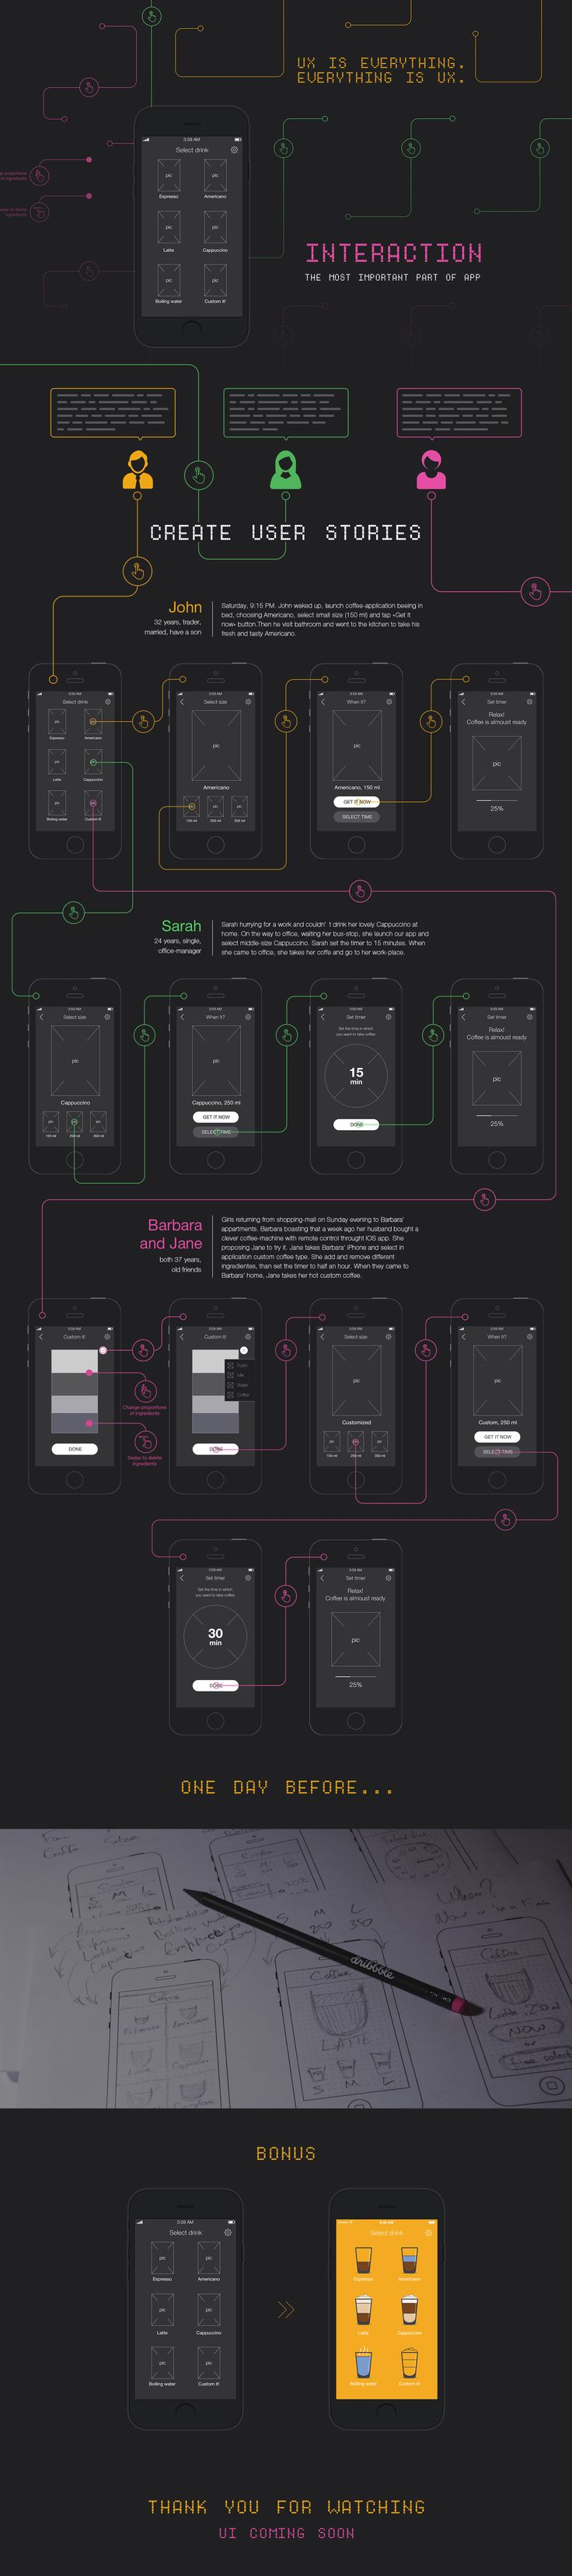 UX-Design of coffee-machine remote control App #wireframe